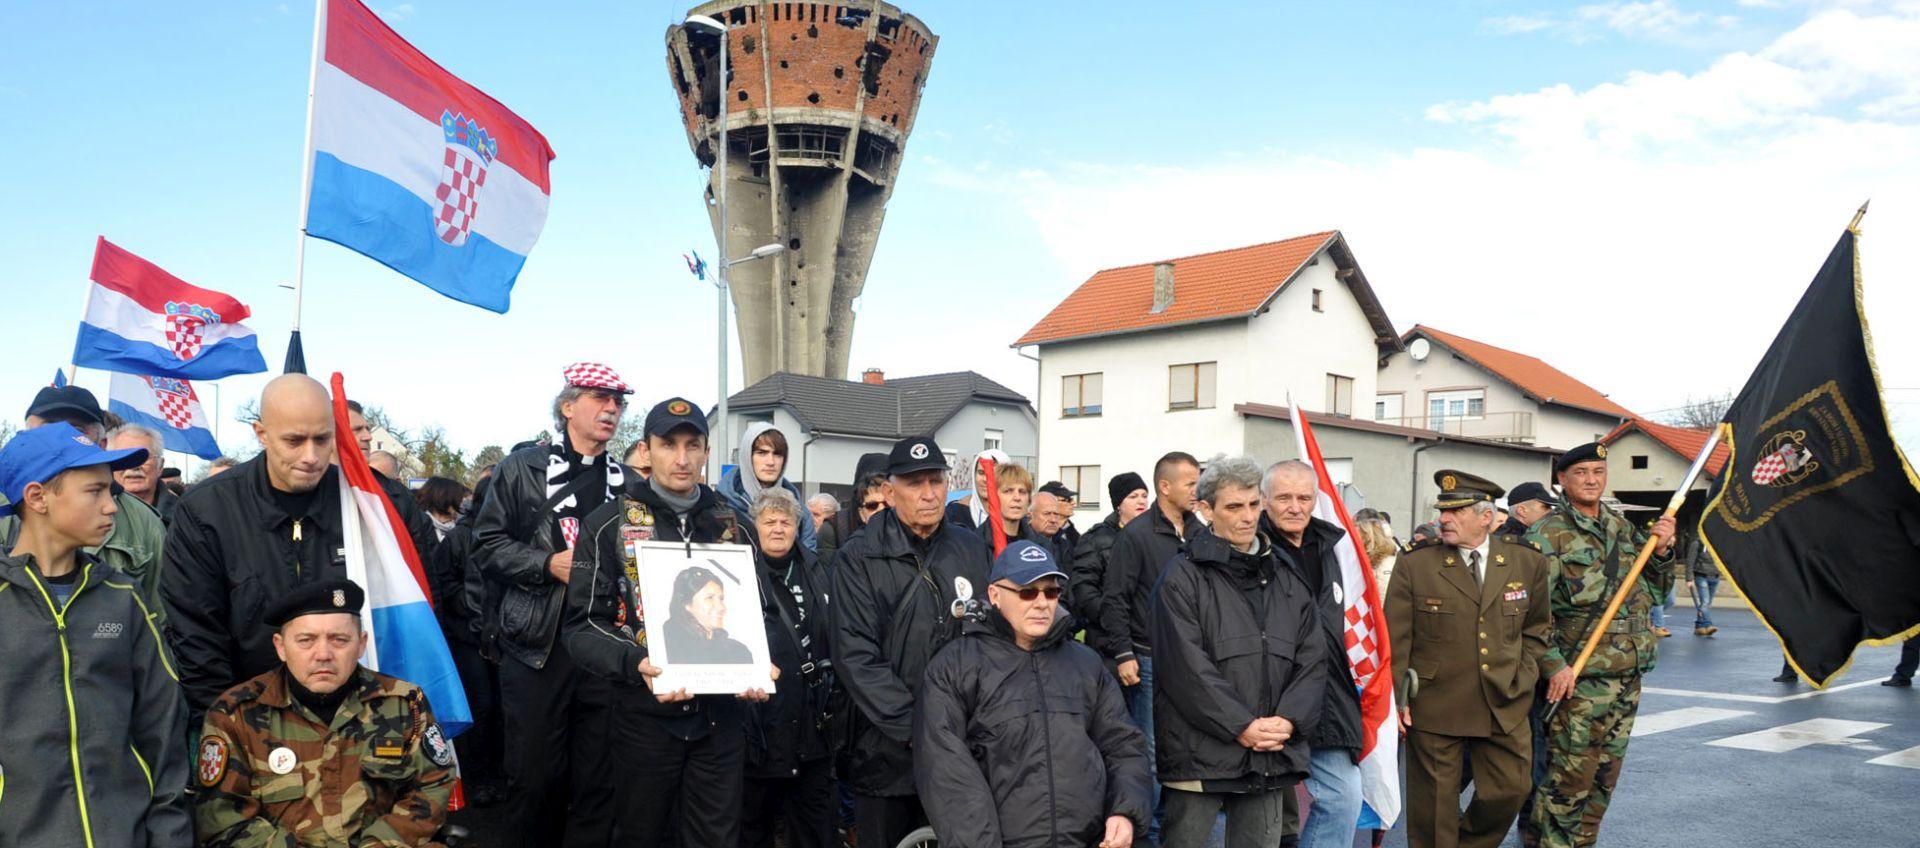 "Pod geslom ""Vukovar-mjesto posebnog pijeteta"" obilježavanje 25. obljetnice bitke za Vukovar"